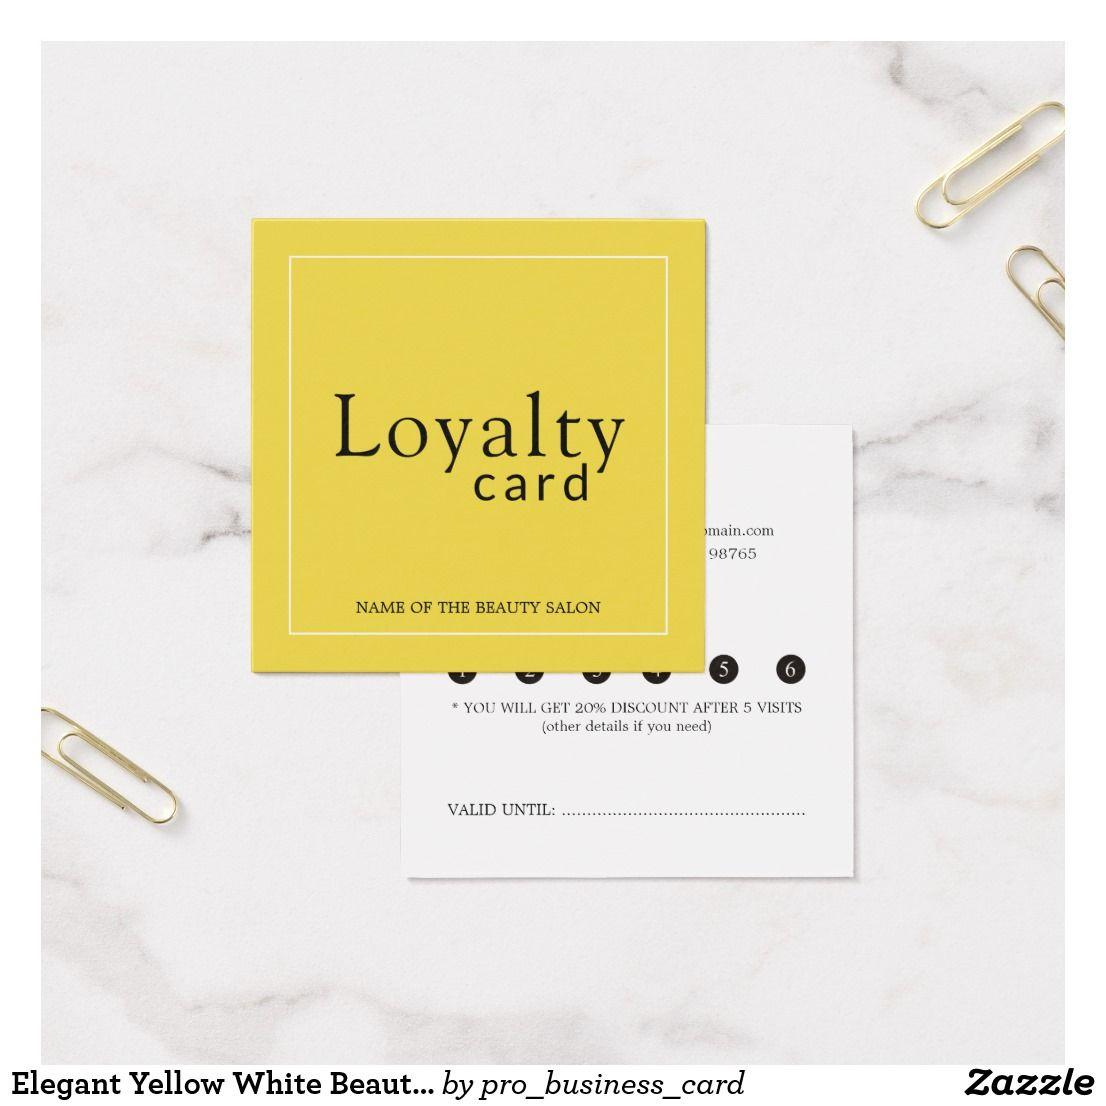 Elegant Yellow White Beauty Salon Loyalty Card  Zazzle.com